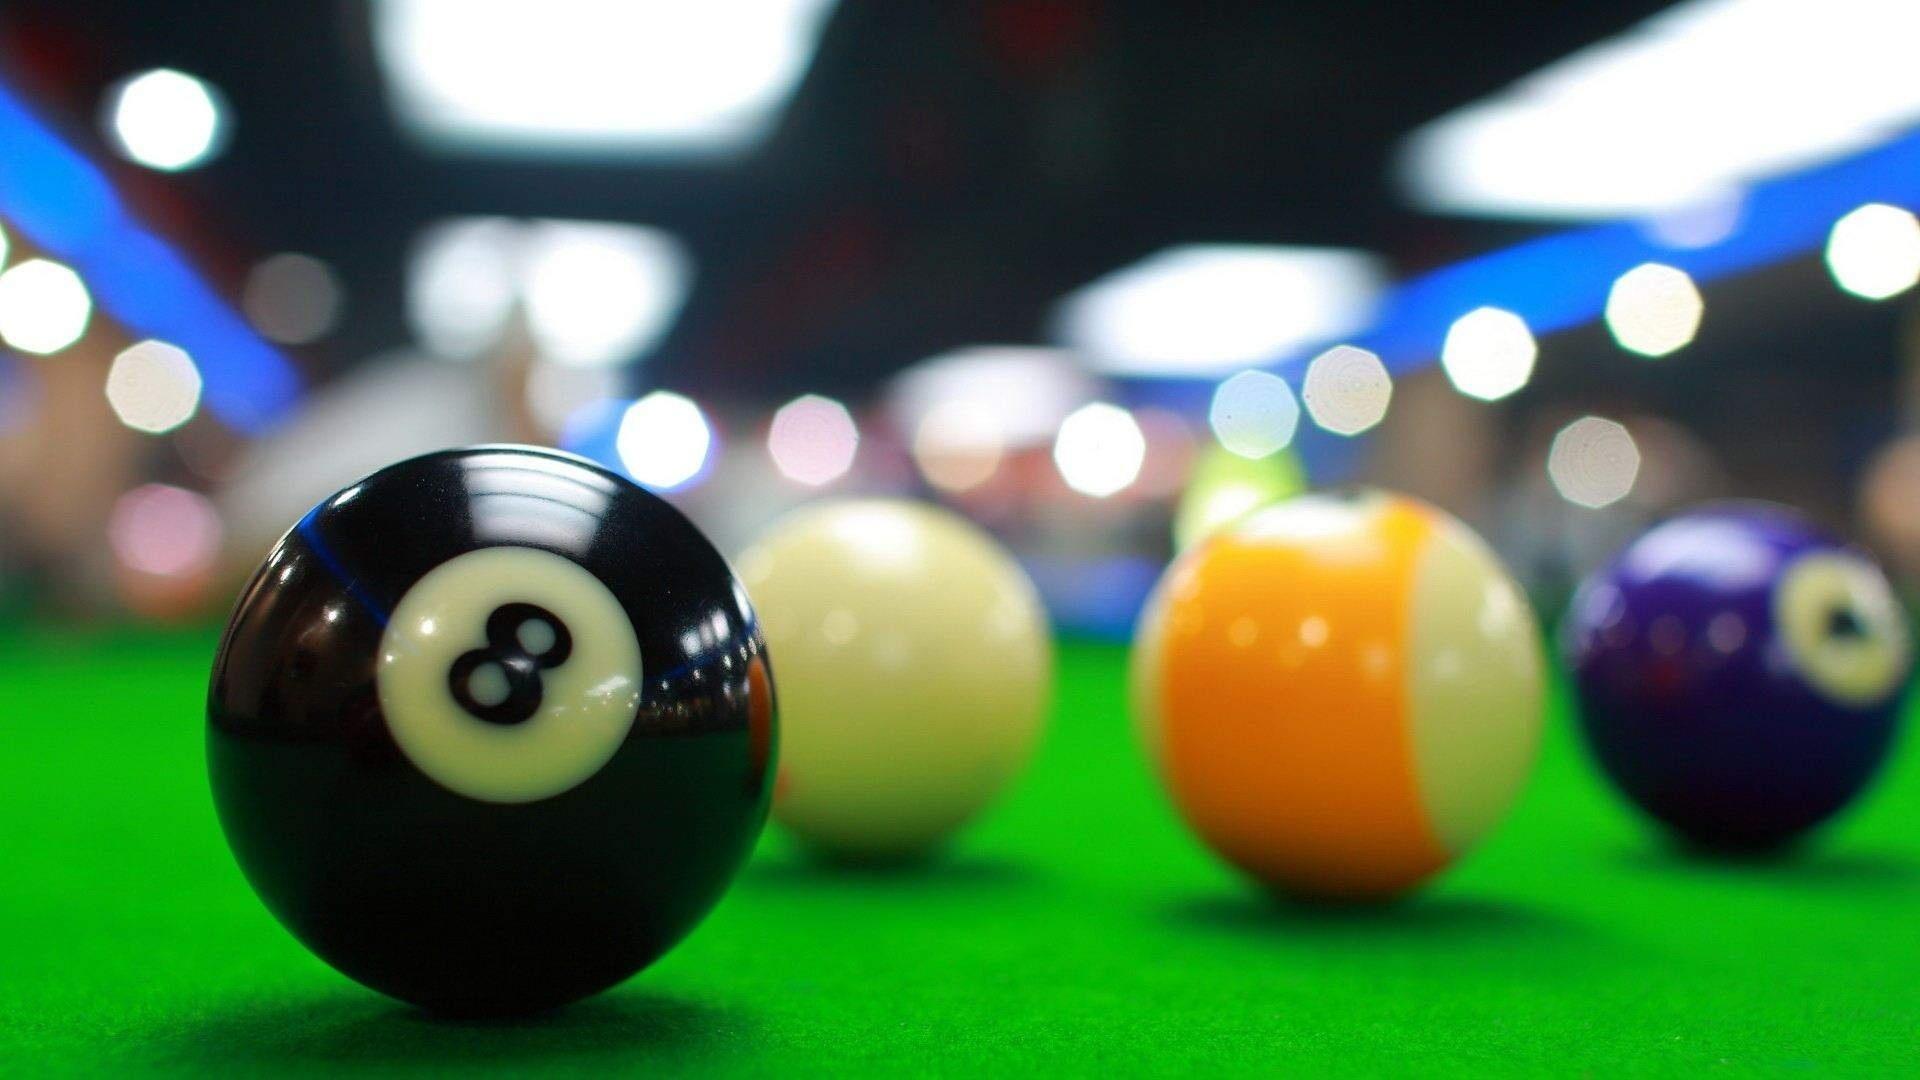 billiard, balls, table, game